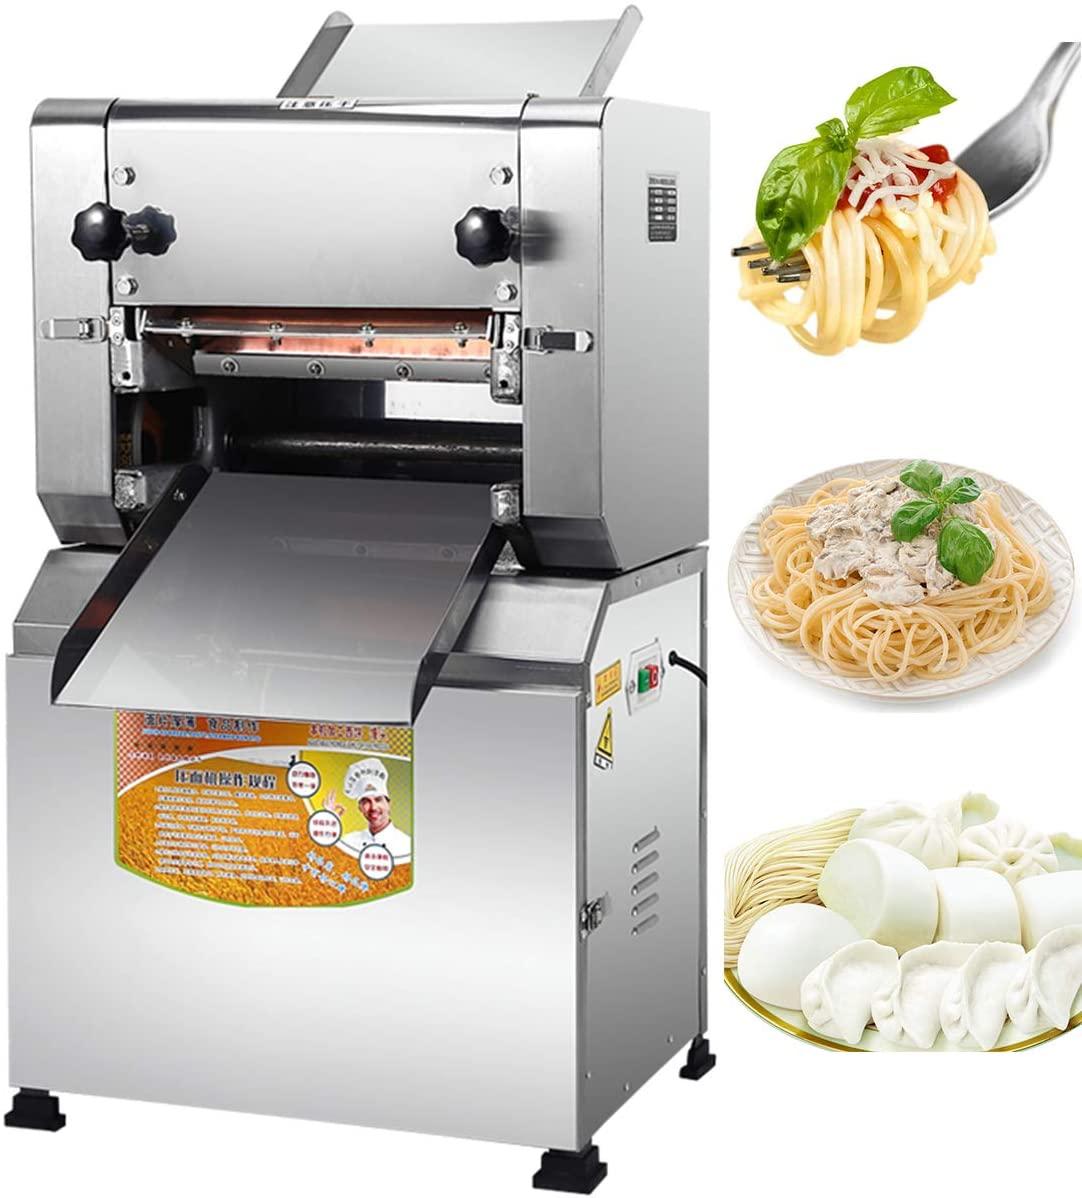 NEWTRY Electric Commercial Pasta Maker Machine Professional Dumpling Dough Noodle Skin Maker Multi-function Noodle Pasta Spaghetti Roller Pressing Machine 1500W (Flat noodles blade 2mm)